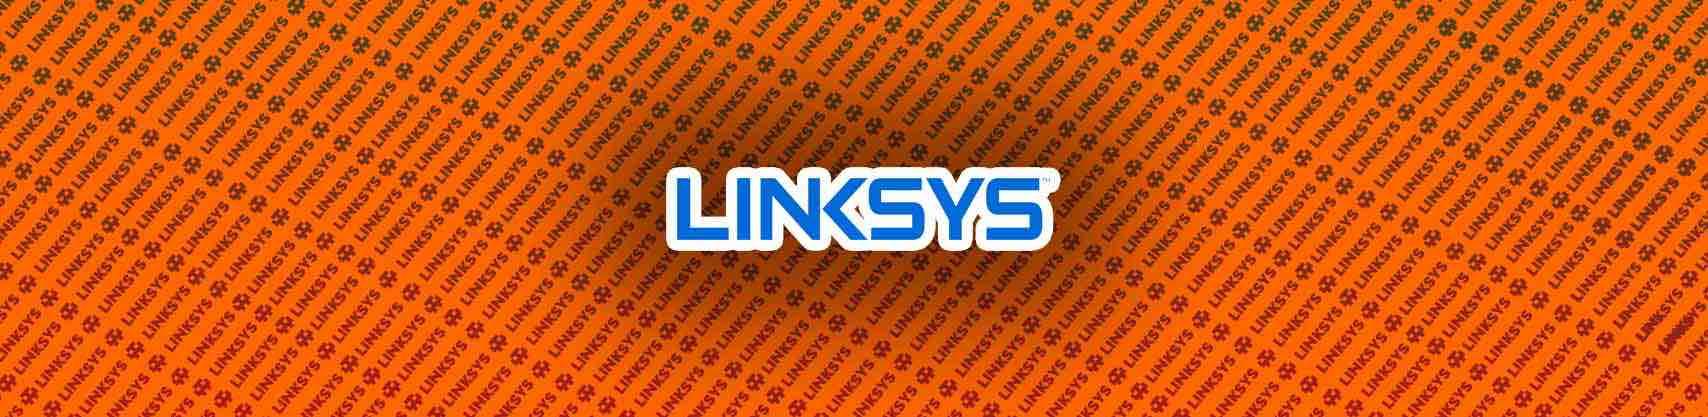 Linksys WRT1900AC Manual